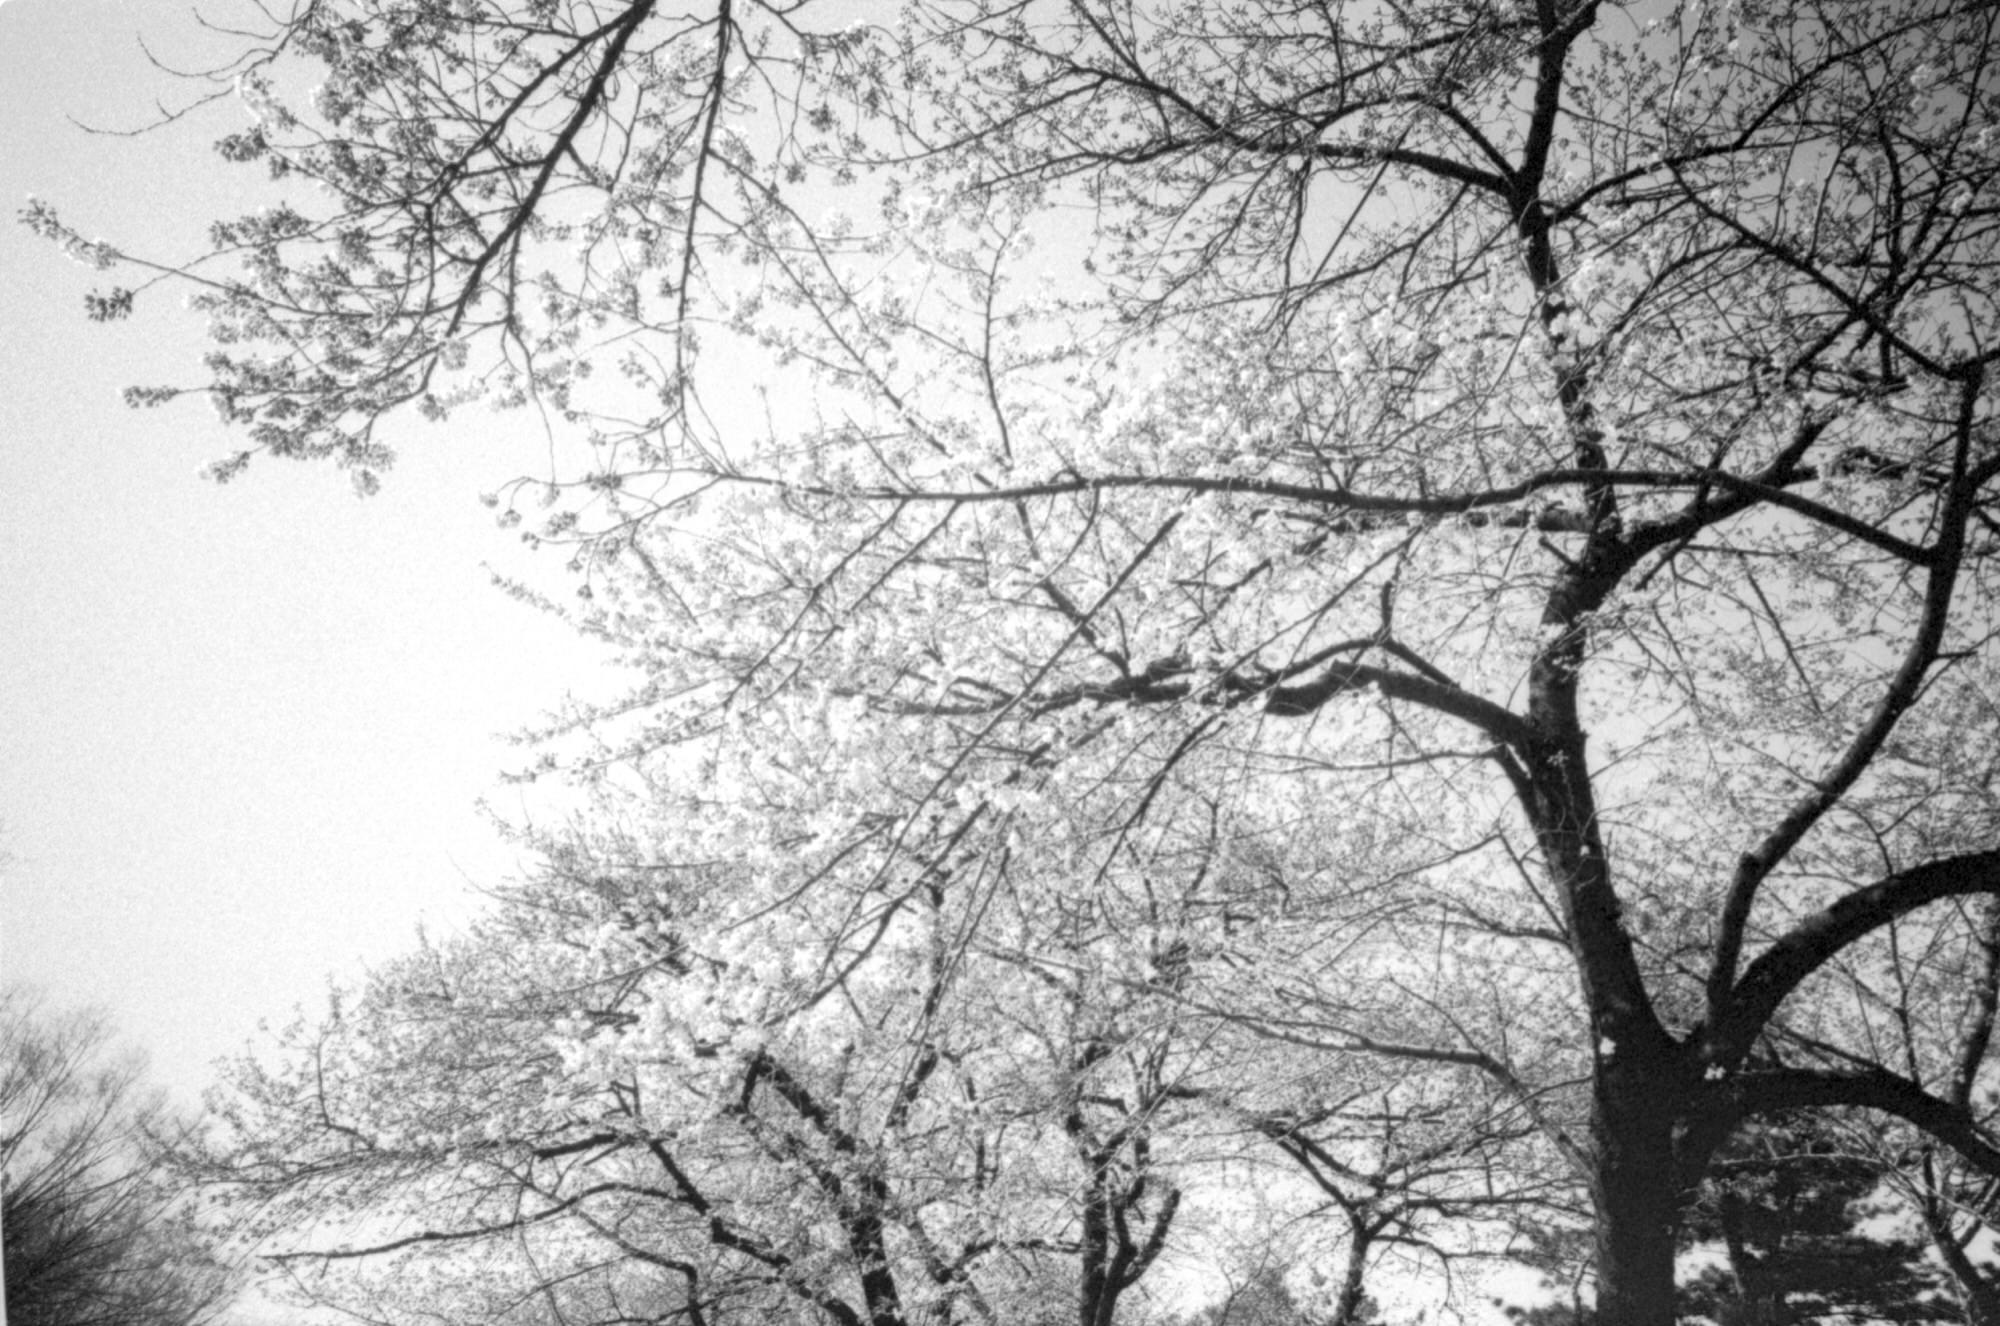 eric kim photography black and white tri x 1600 leica mp 35mm film-21